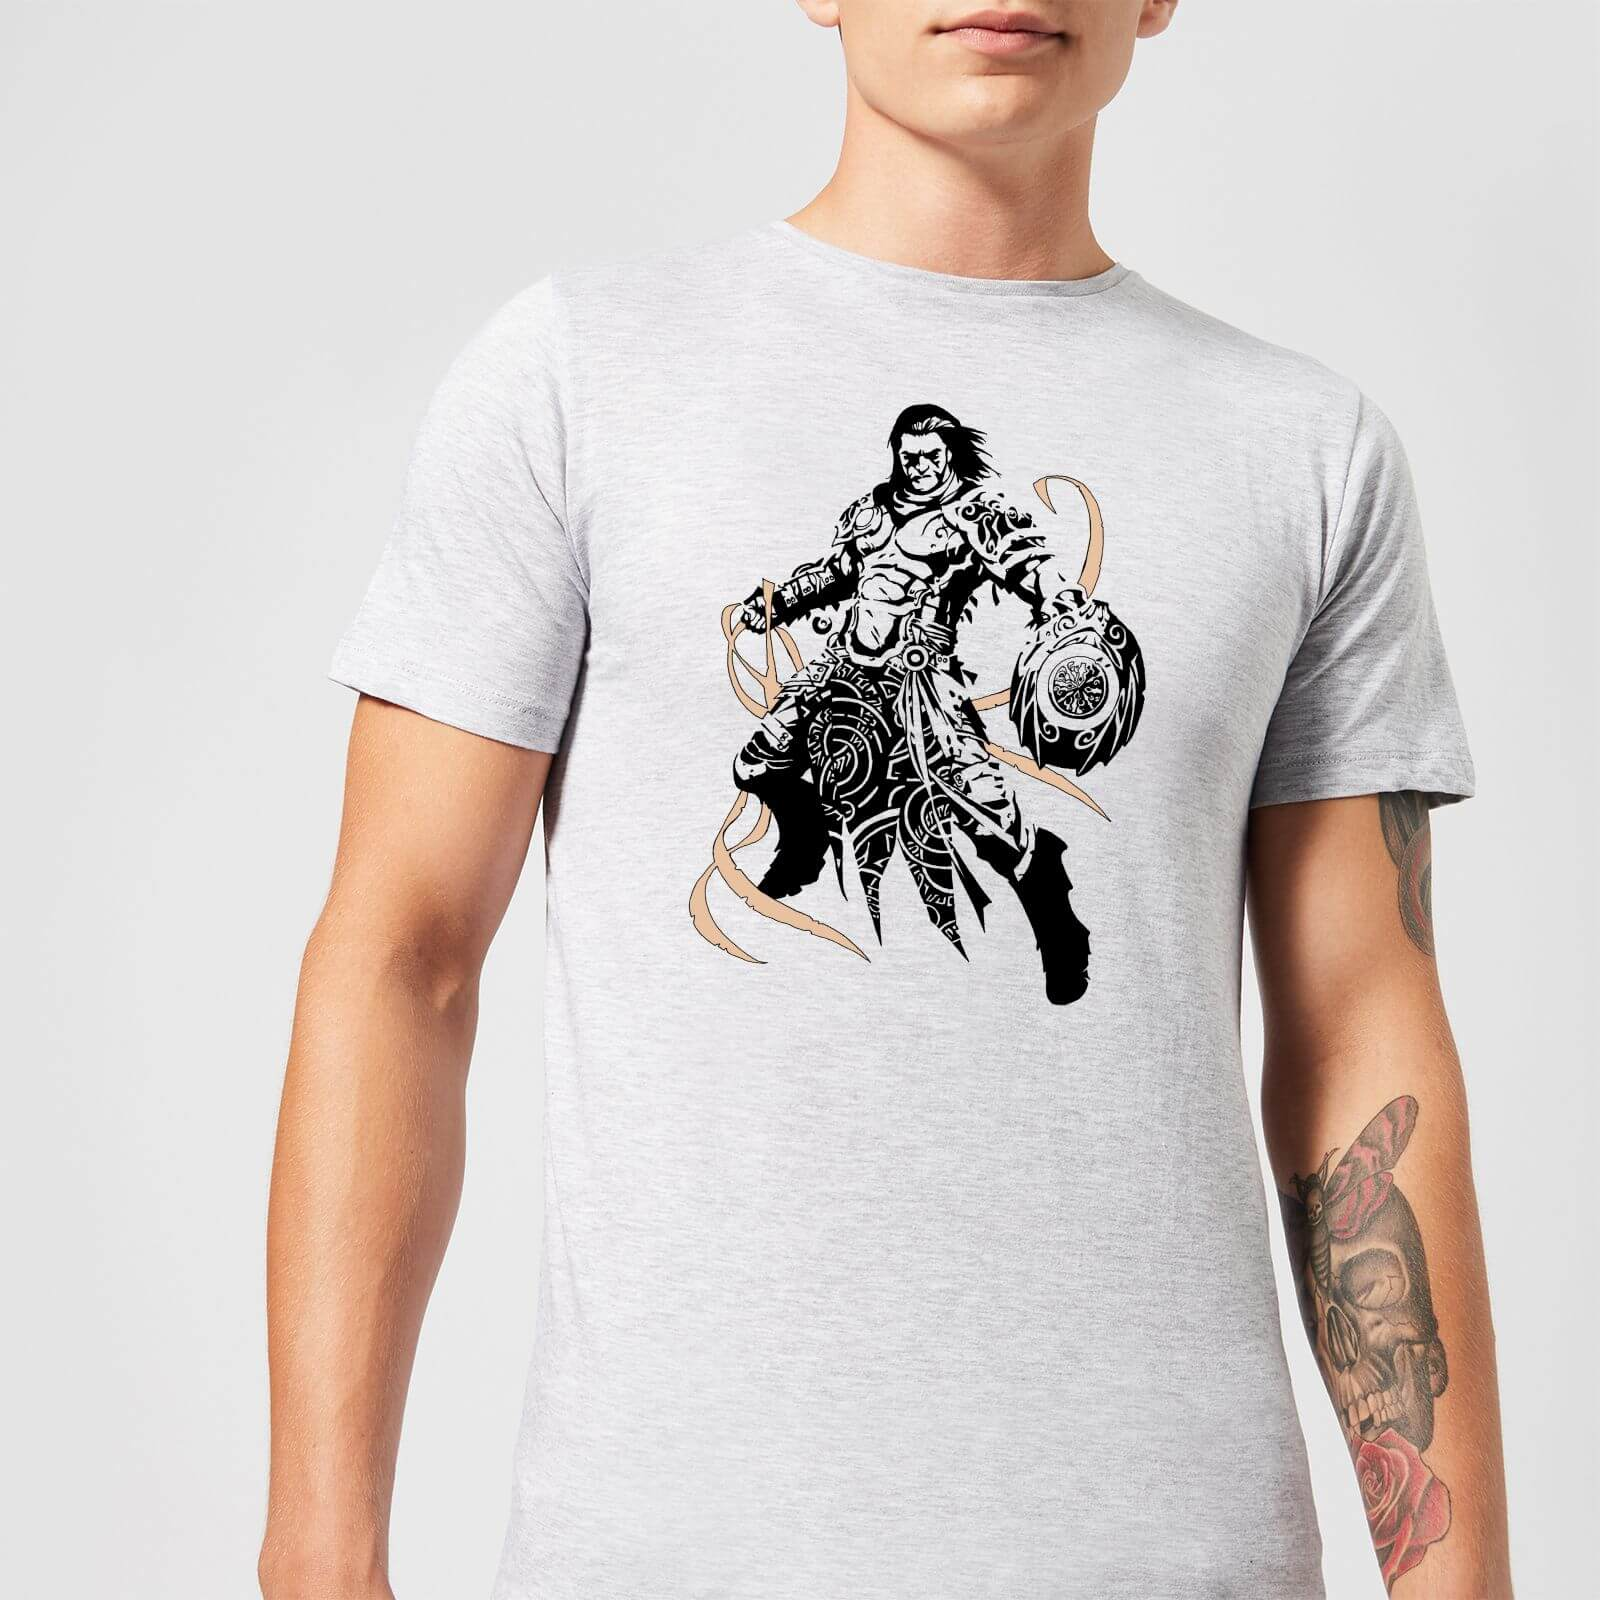 Magic The Gathering Gideon Character Art T-Shirt - Grau - 3XL - Grau